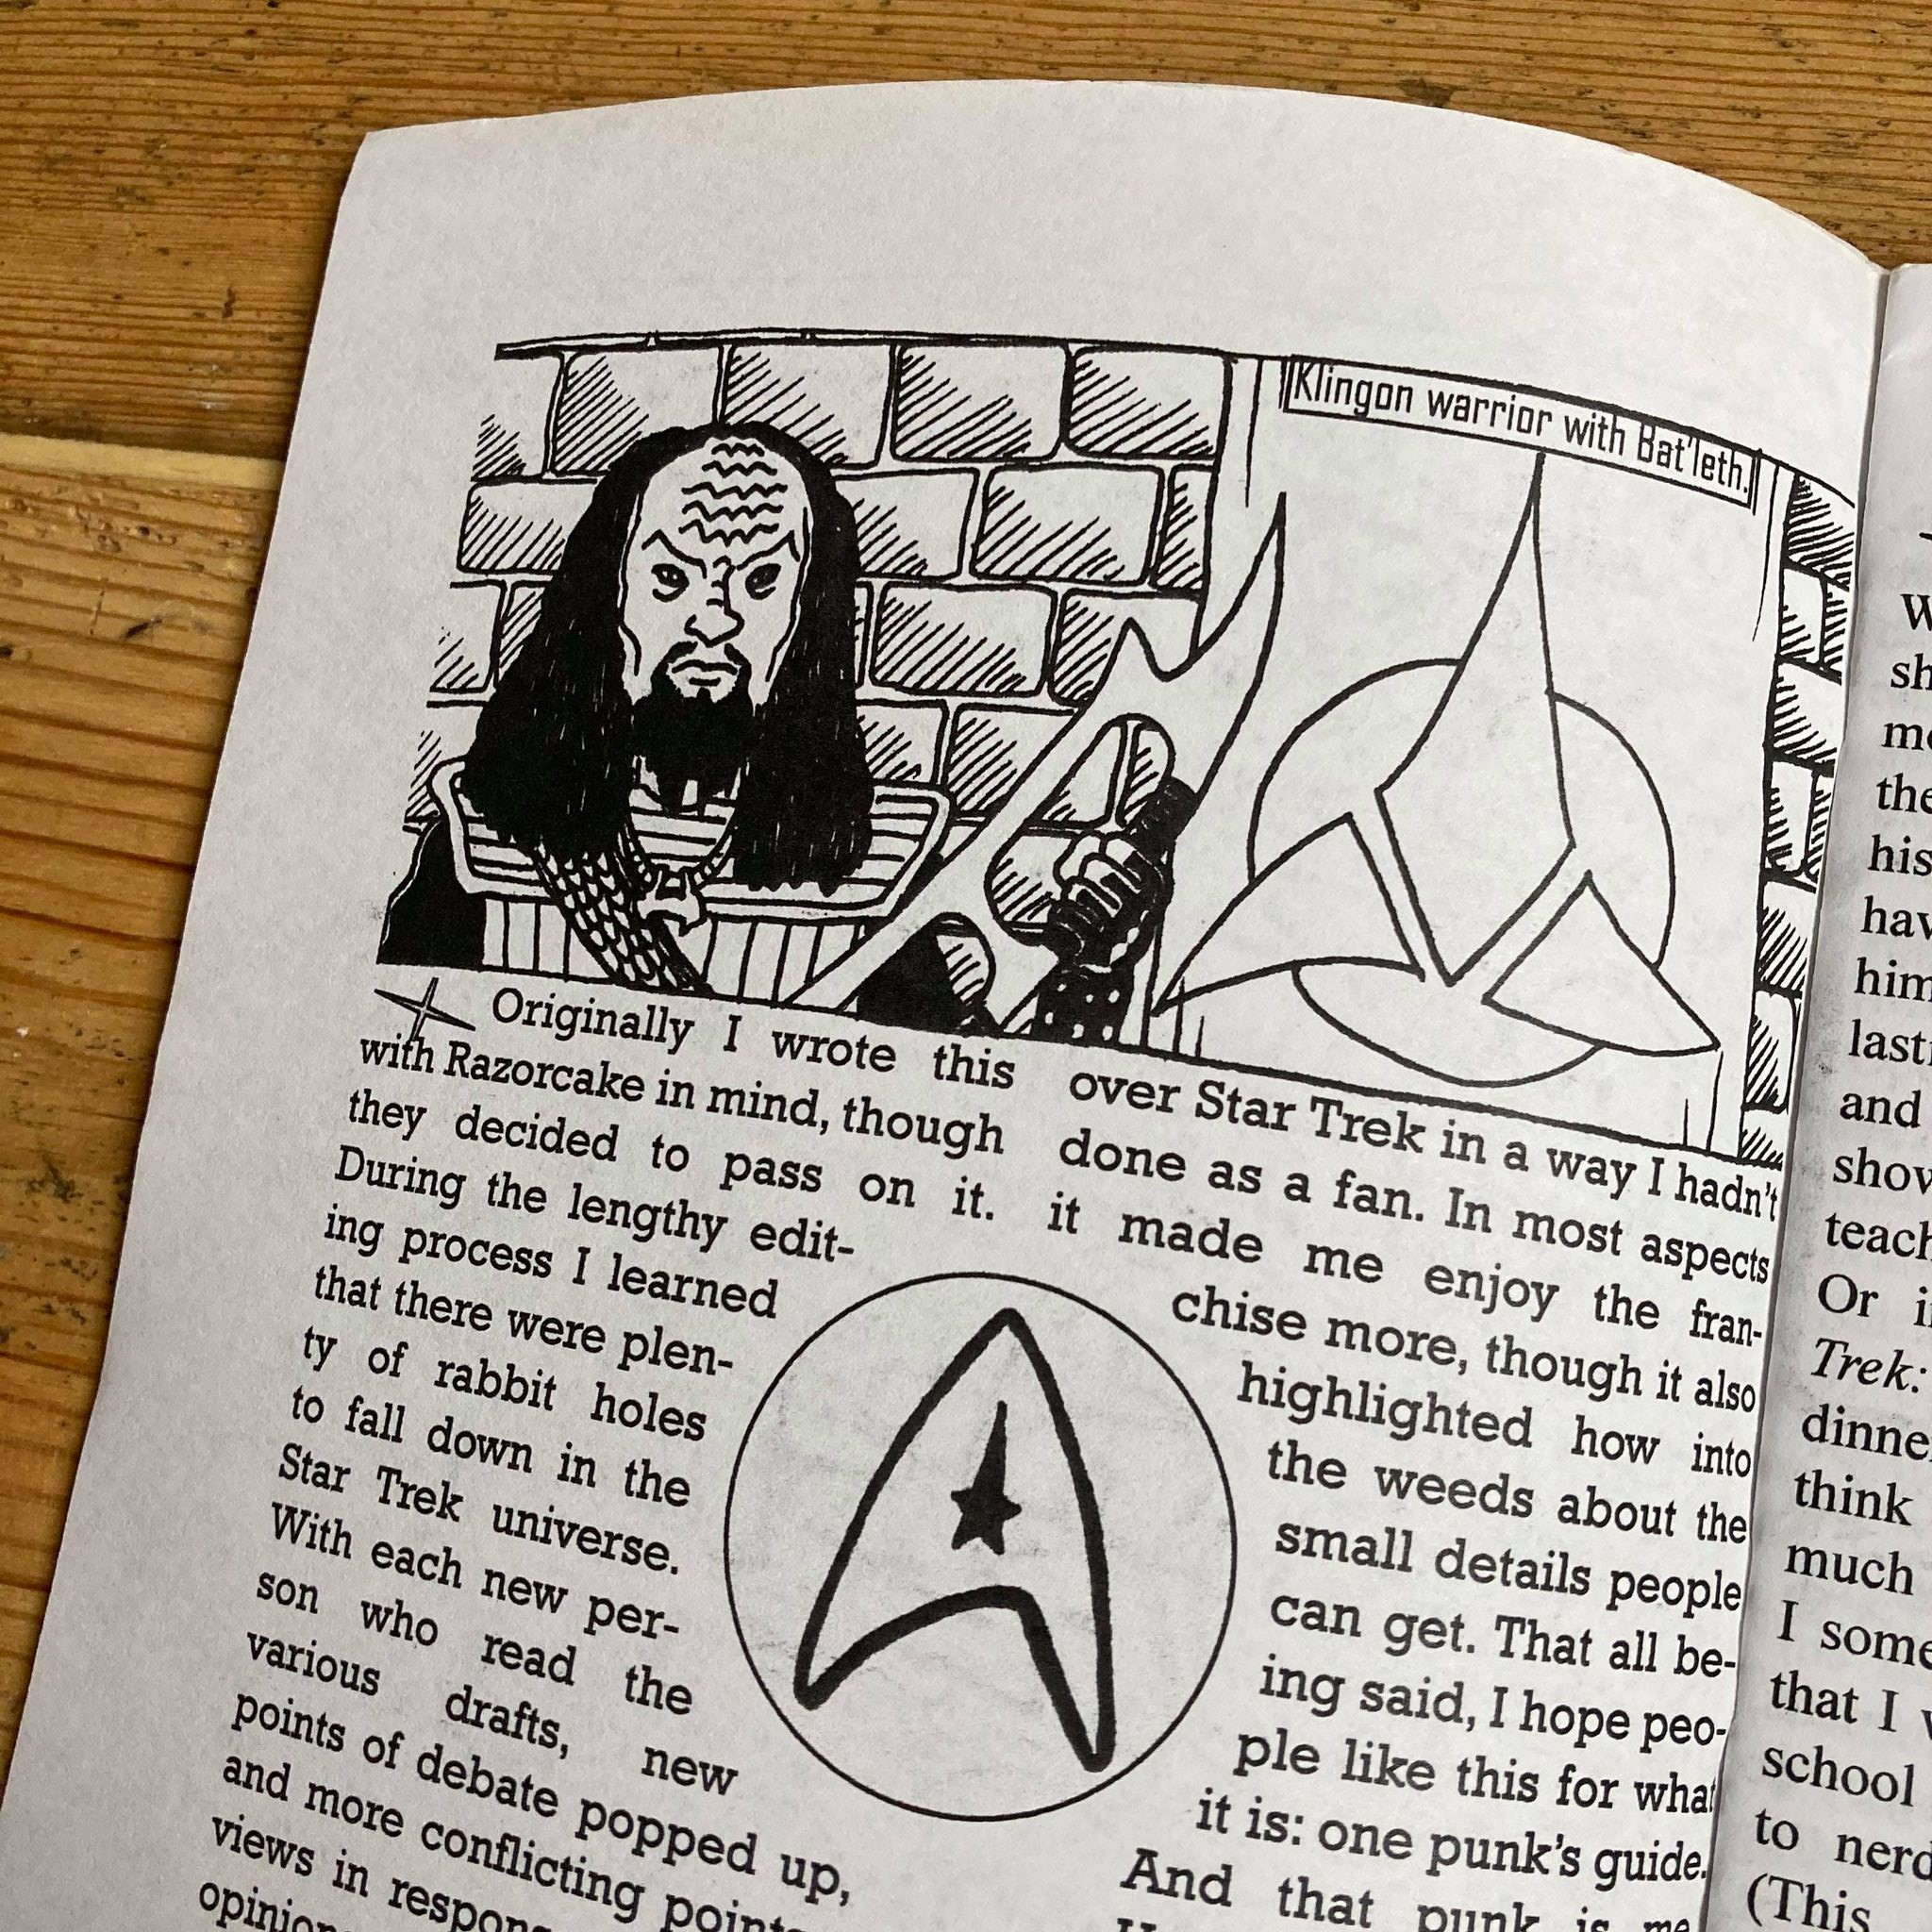 One Punk's Guide to Star Trek zine by Kayla Greet